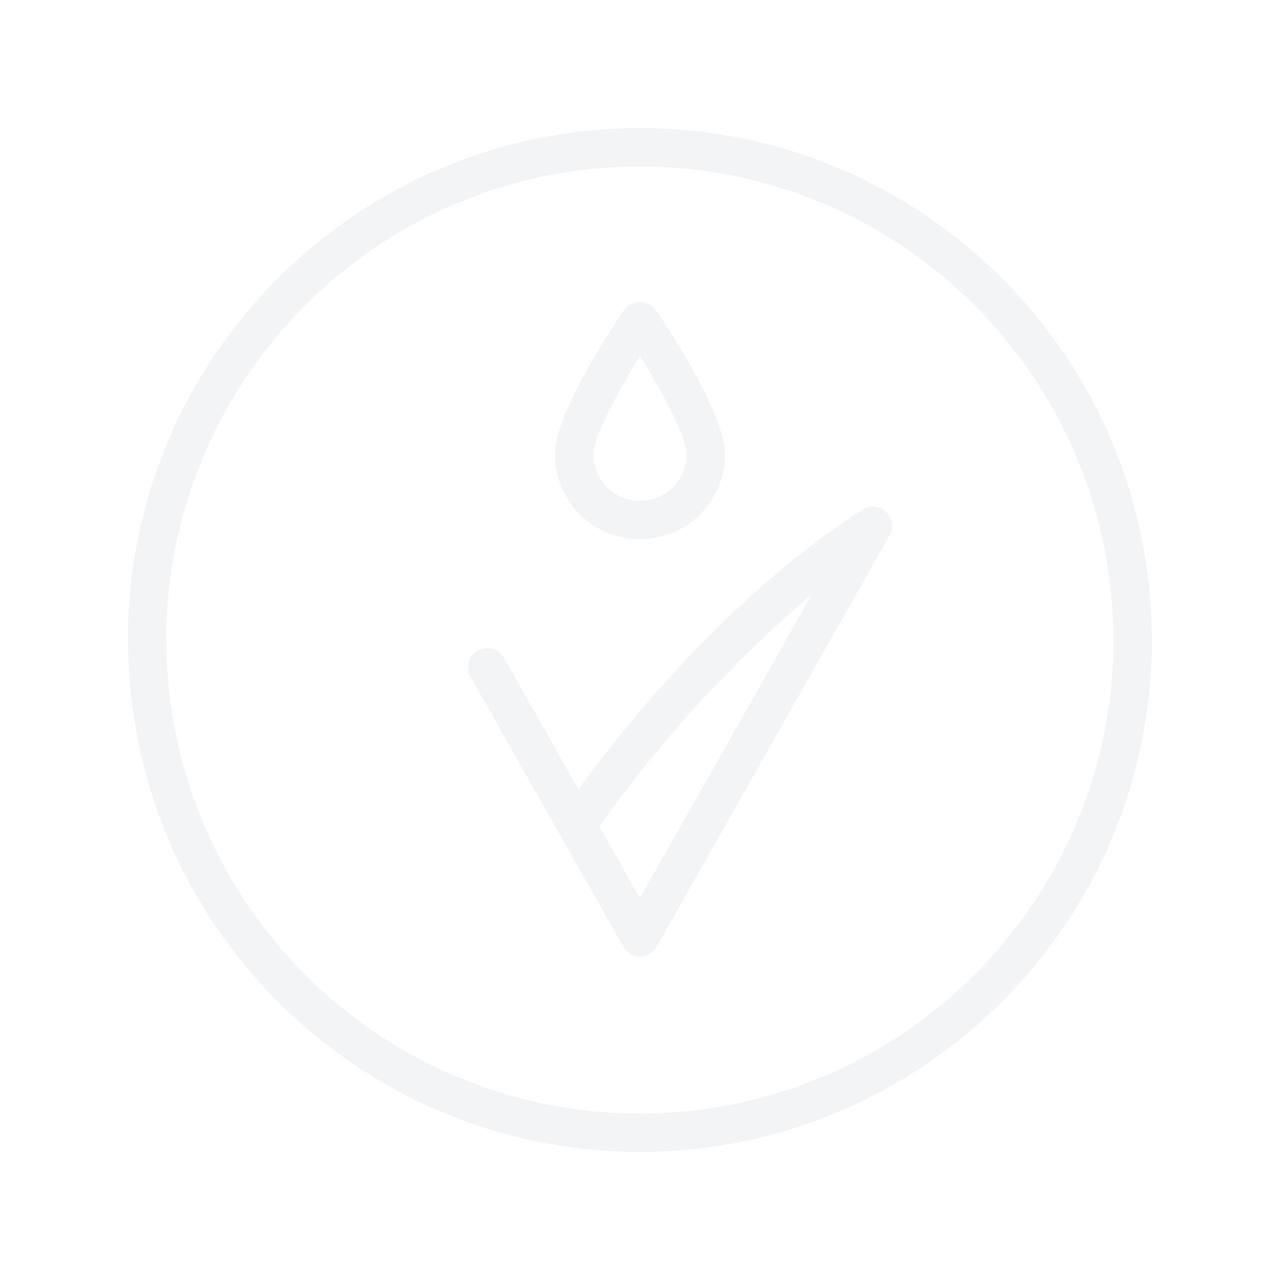 ELIZABETH ARDEN My Fifth Avenue Eau De Parfum